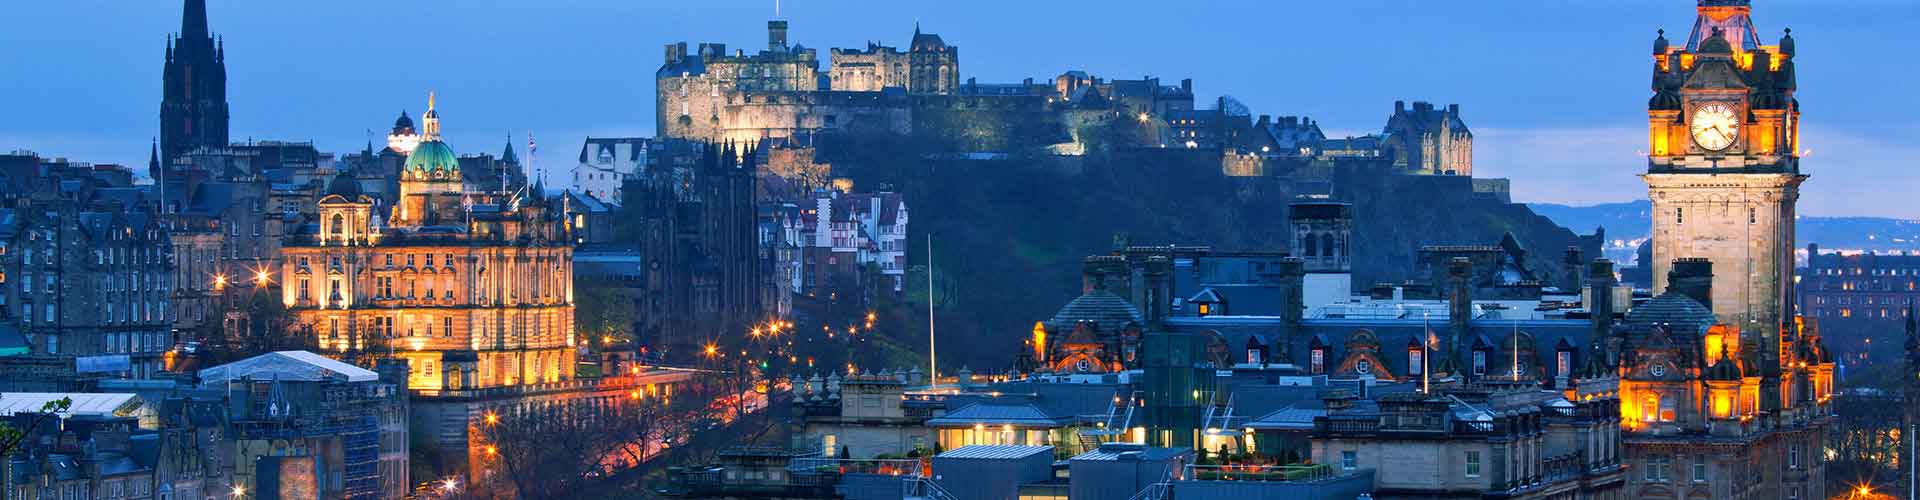 Edimburgo – Ostelli a Edimburgo. Mappe per Edimburgo, Foto e  Recensioni per ogni Ostello a Edimburgo.